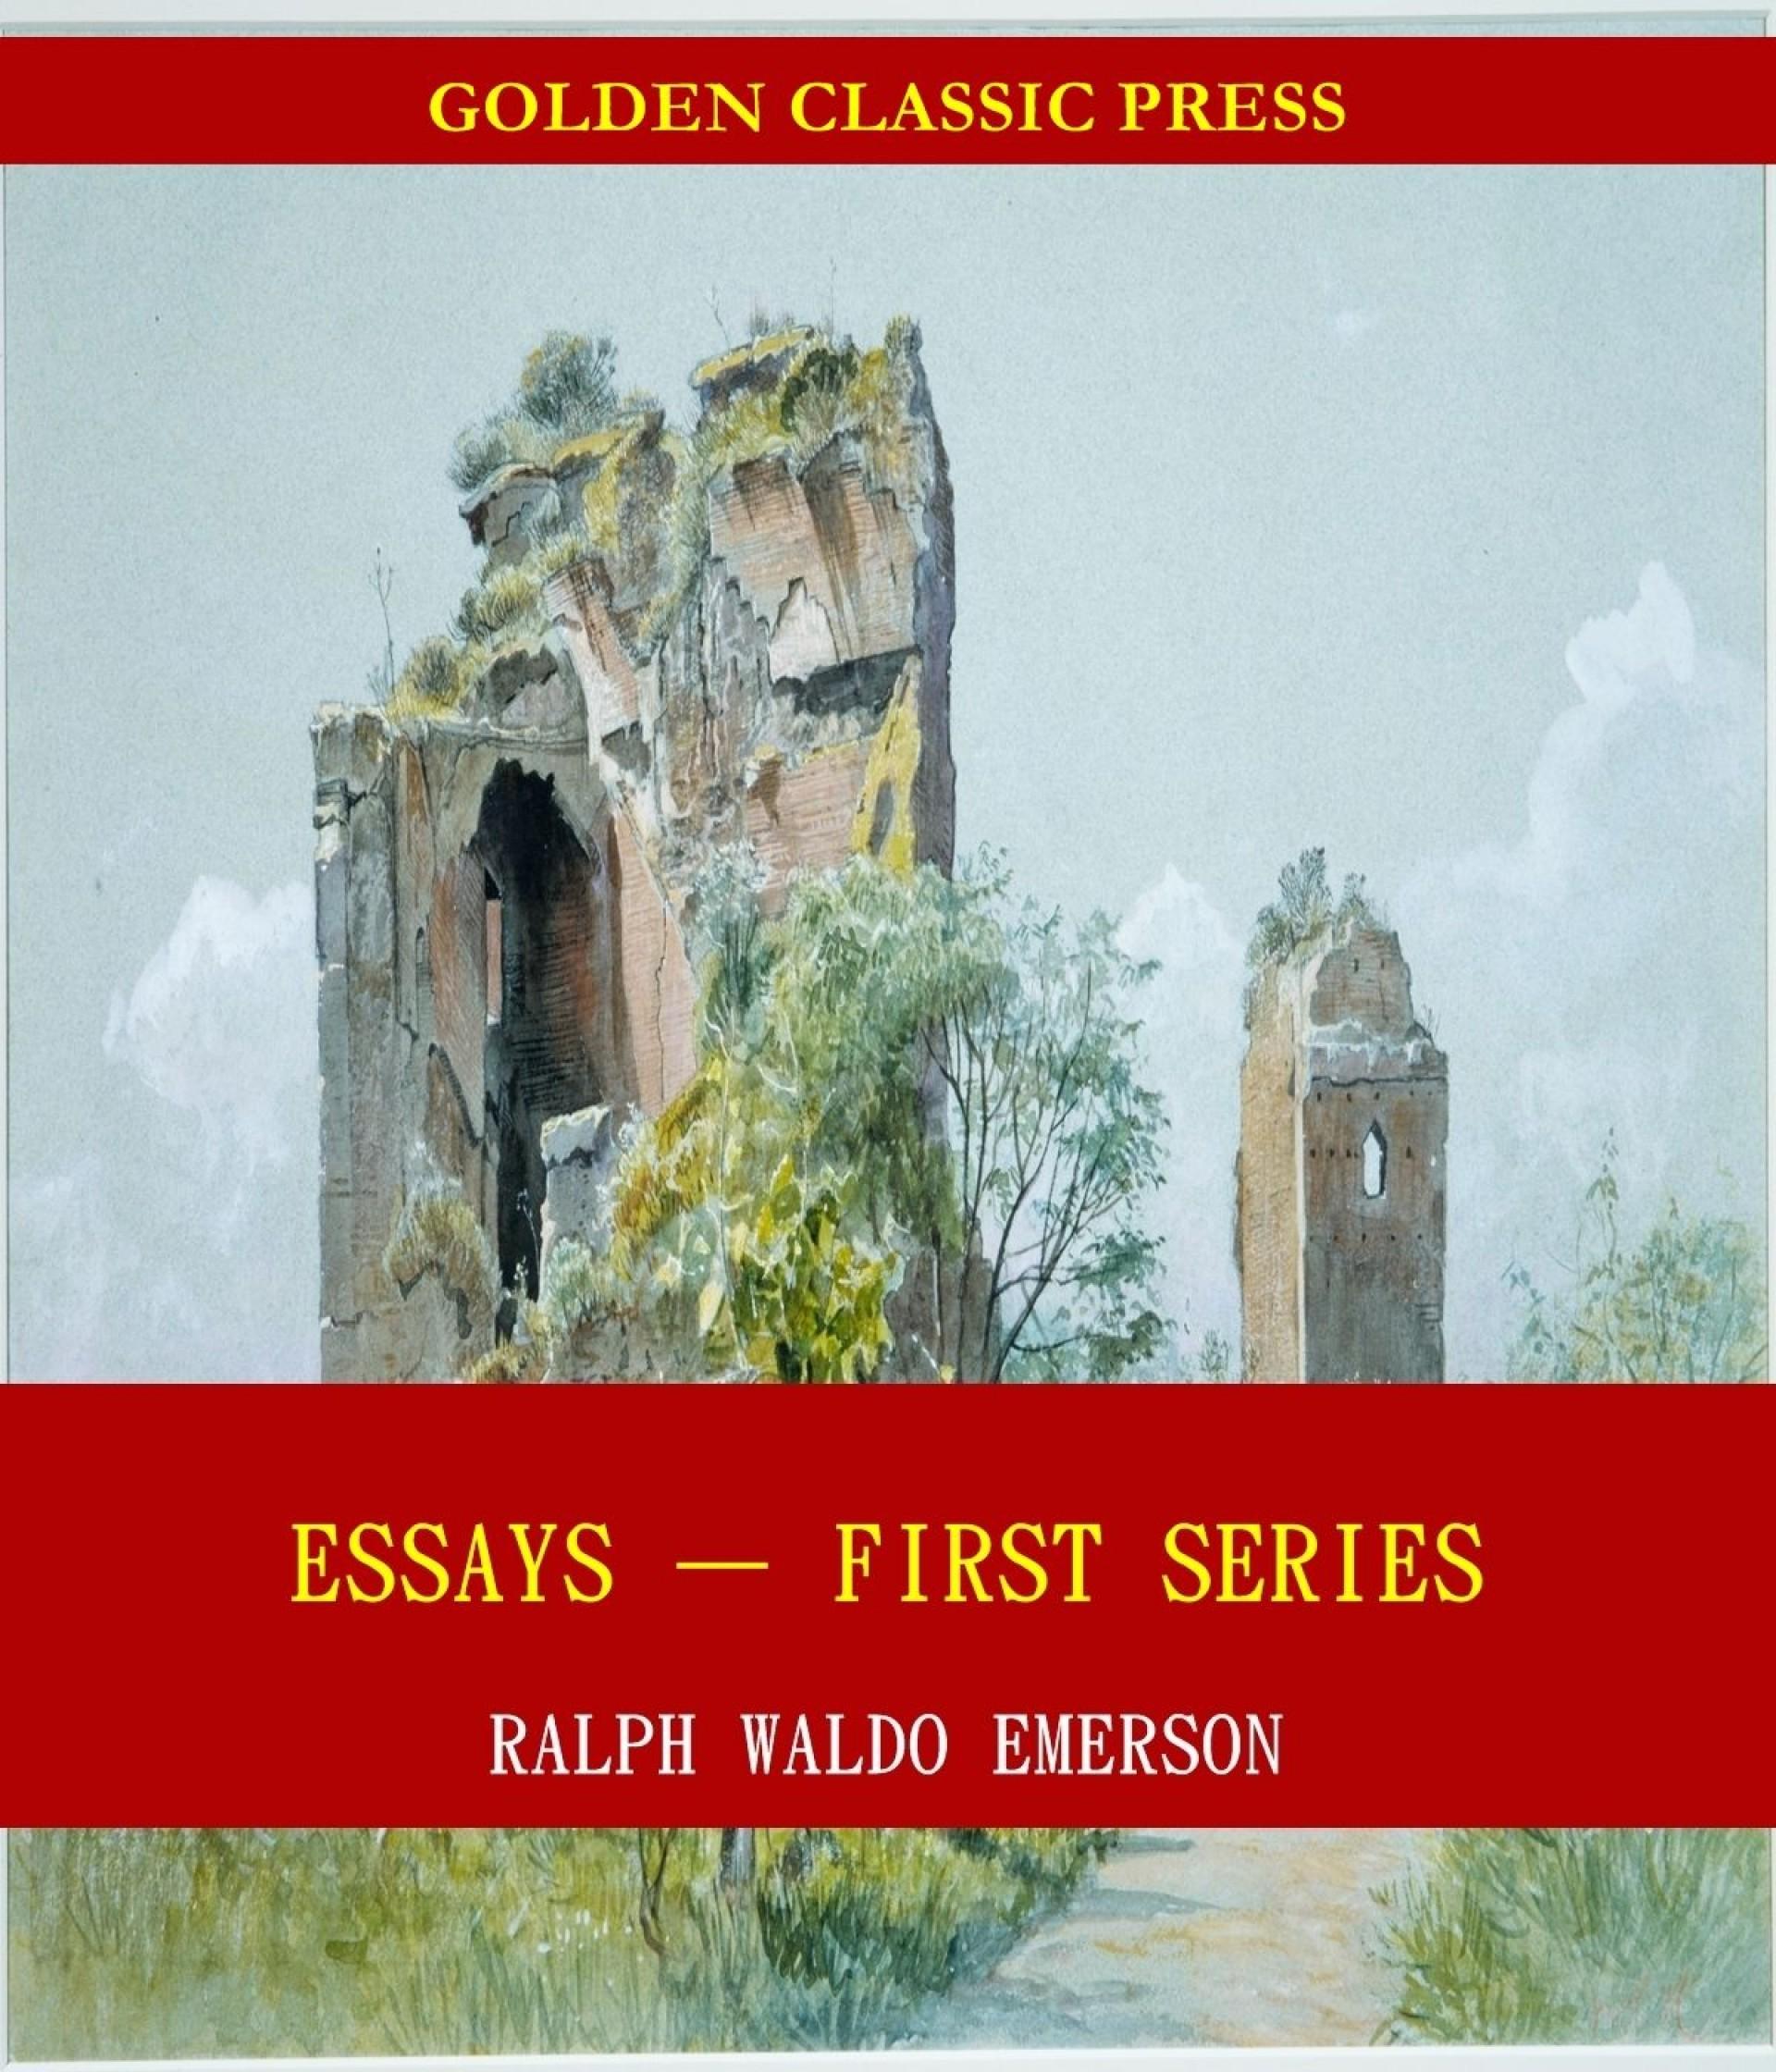 008 Essays First Series Essay Example Stunning In Zen Buddhism Emerson's Value 1920